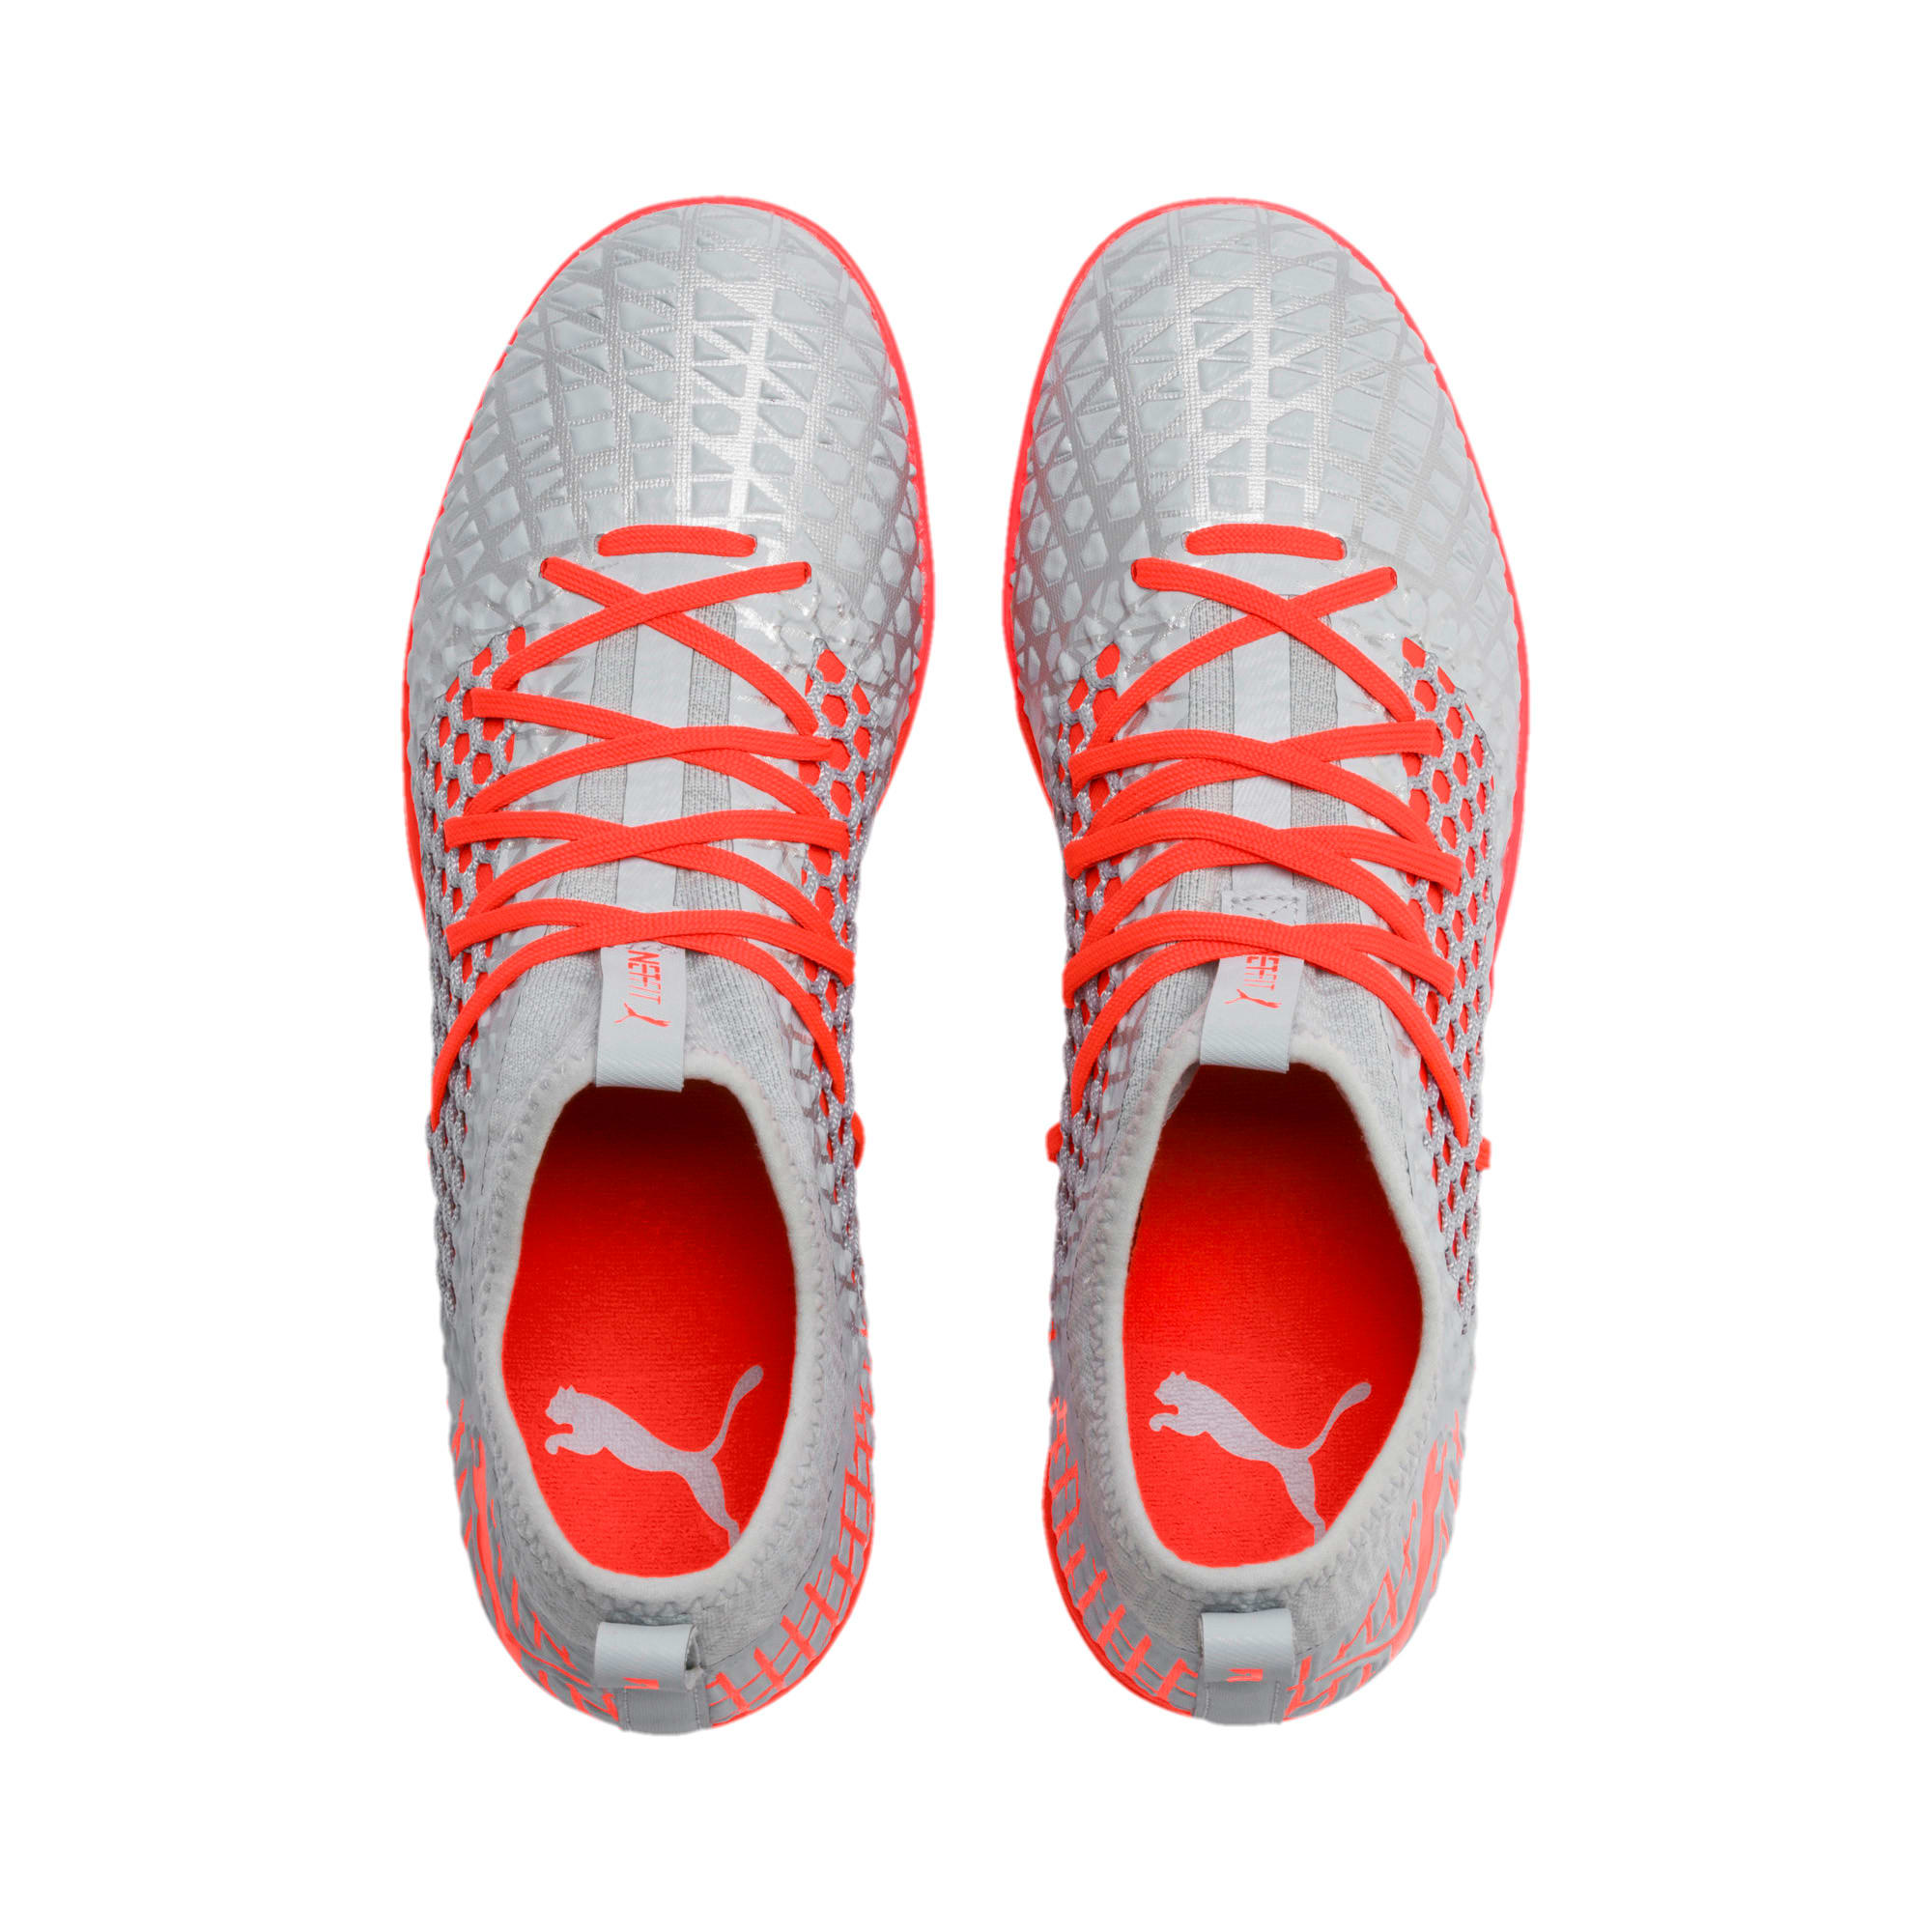 Thumbnail 7 of FUTURE 4.3 NETFIT IT Men's Soccer Shoes, Glacial Blue-Nrgy Red, medium